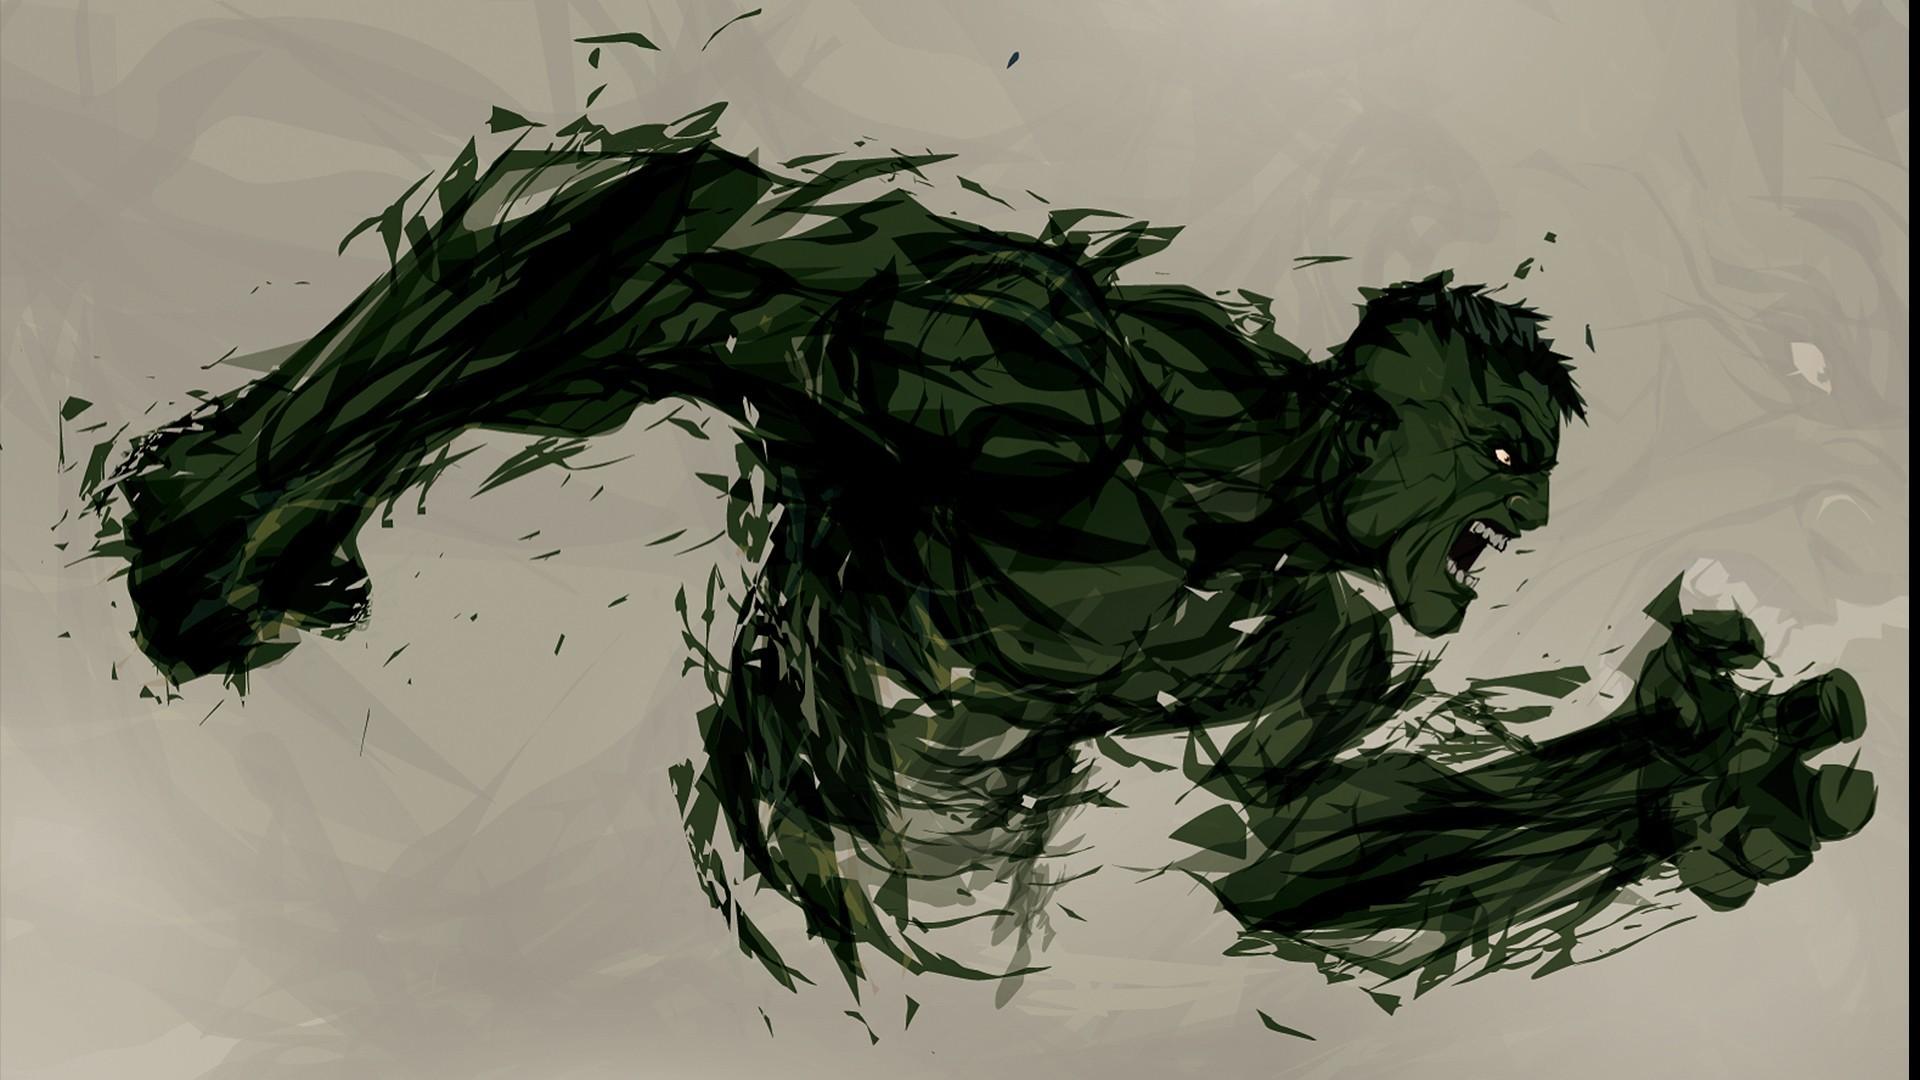 Res: 1920x1080, Hulk wallpapers HD desktop download.